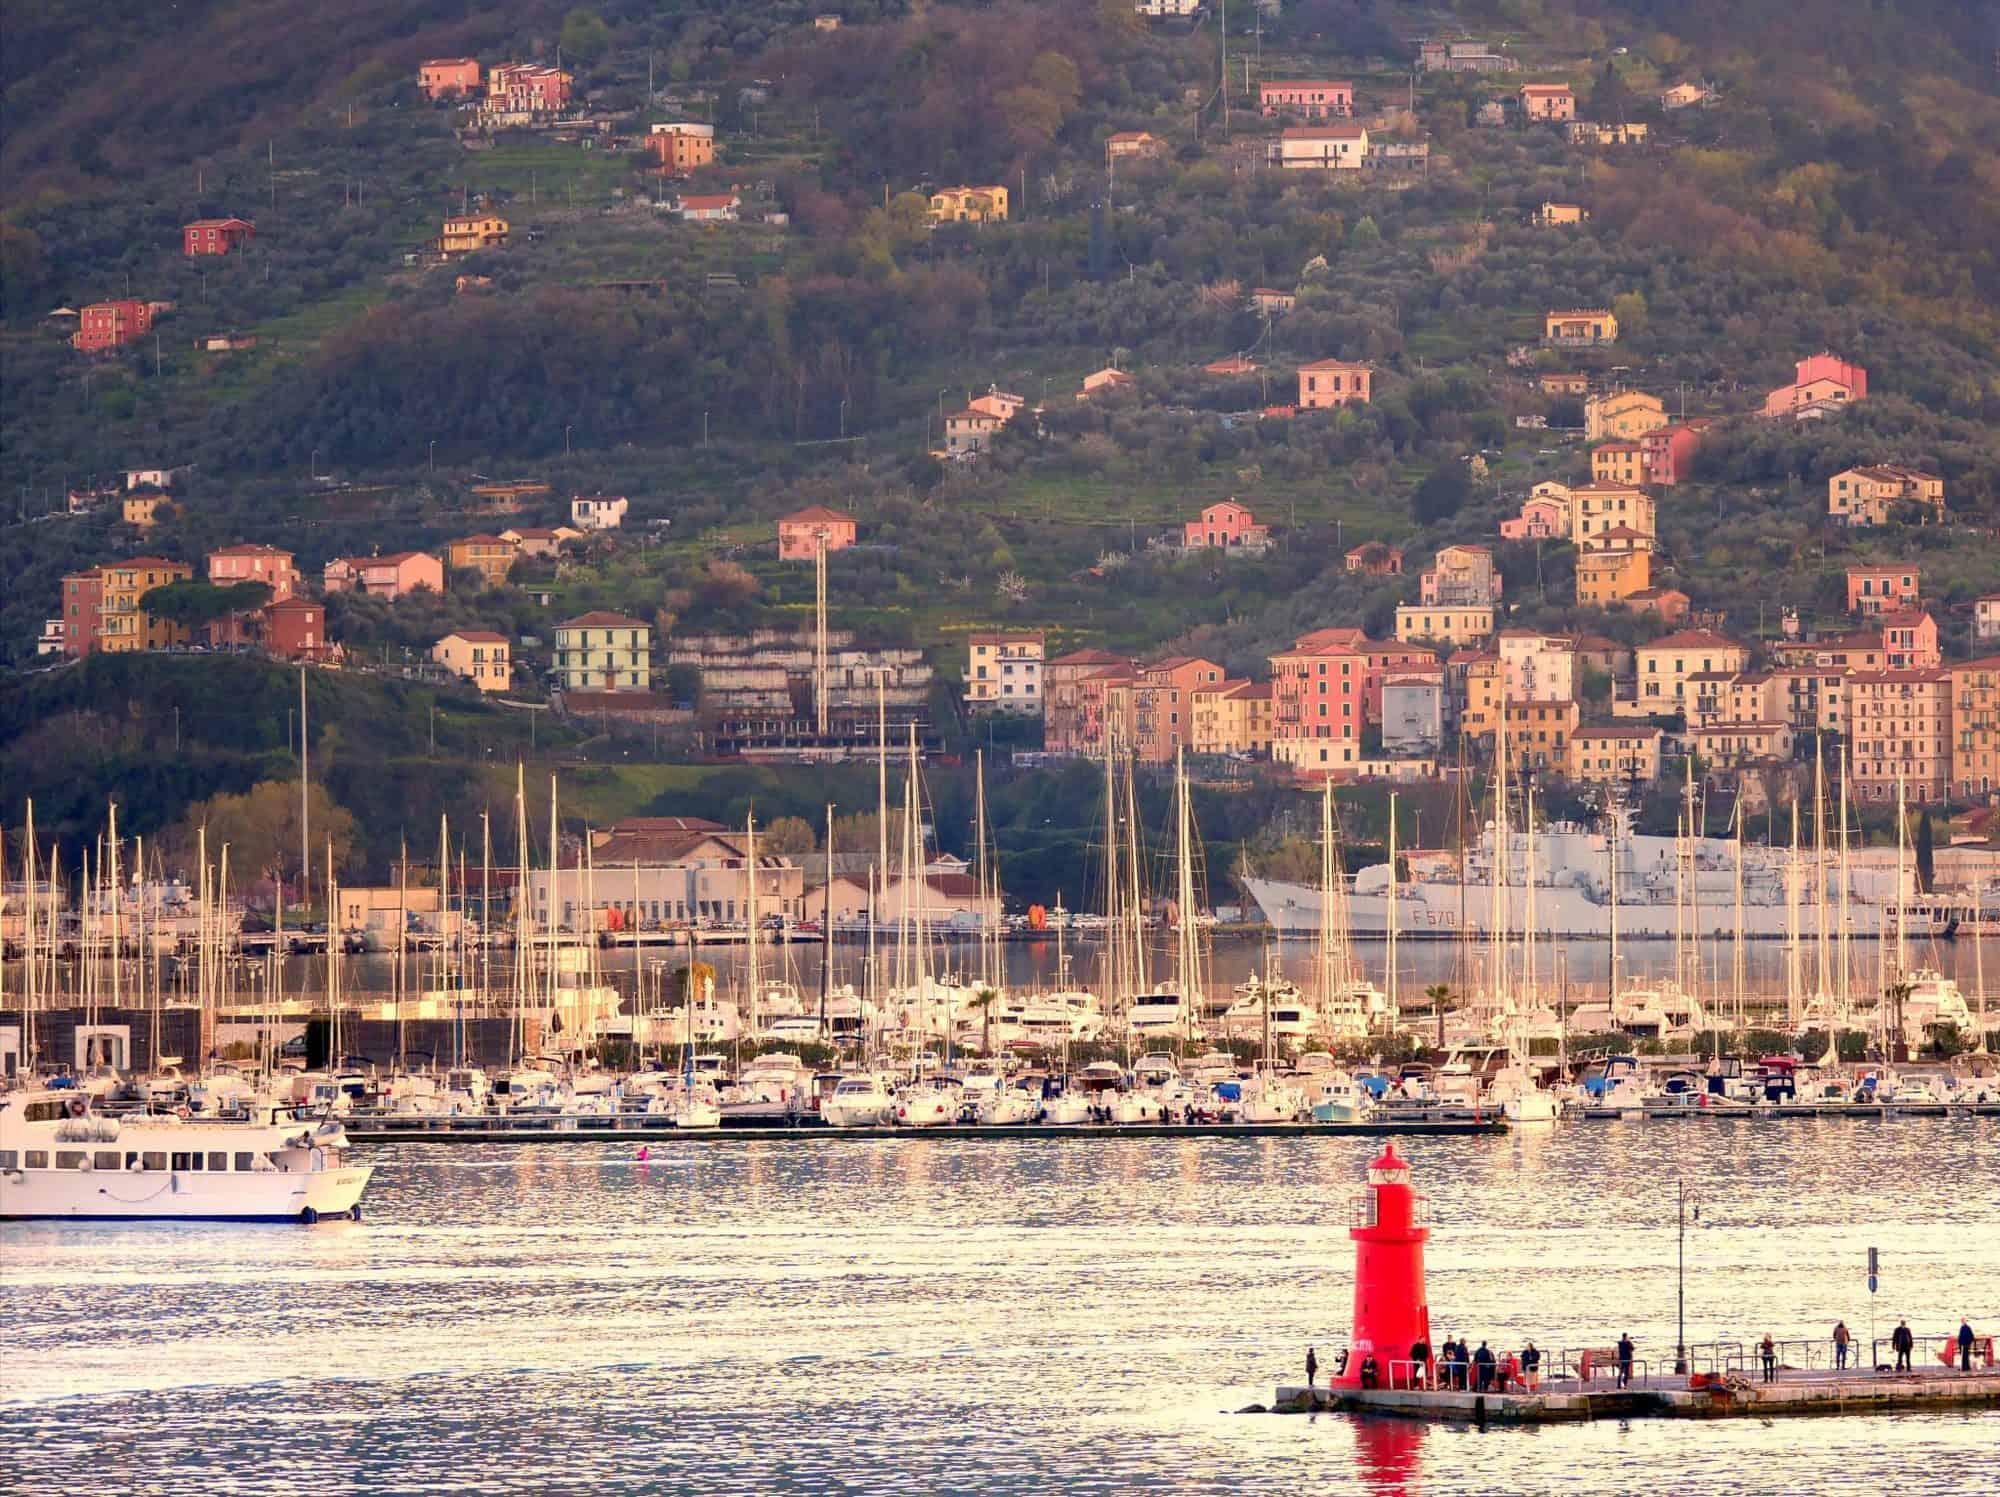 Royal Caribbean Mediterranean Cruise with Kids